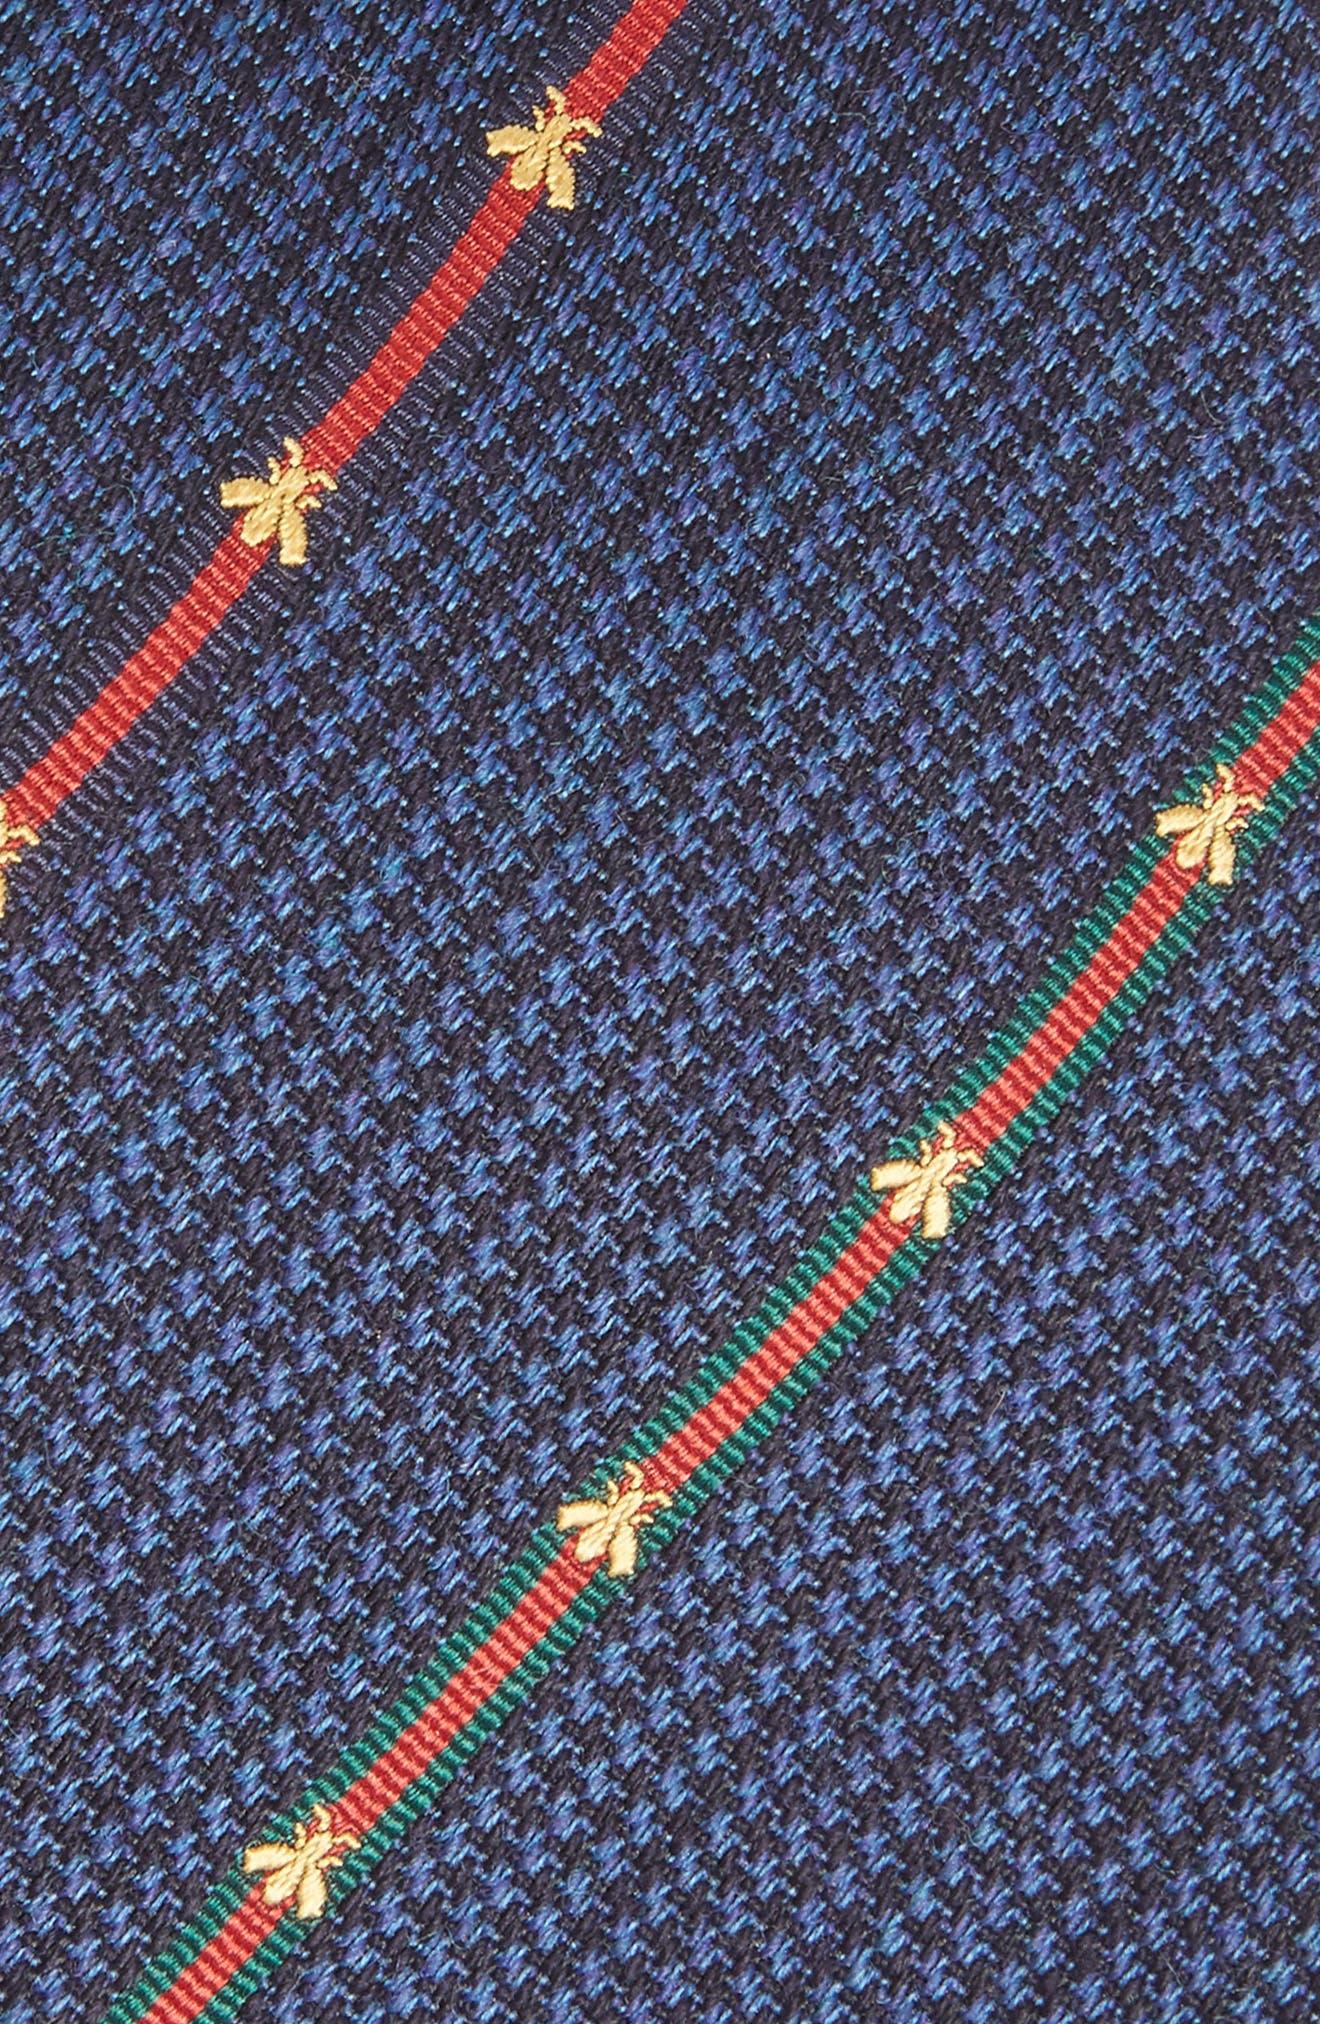 Savanur Silk & Wool Tie,                             Alternate thumbnail 2, color,                             Navy